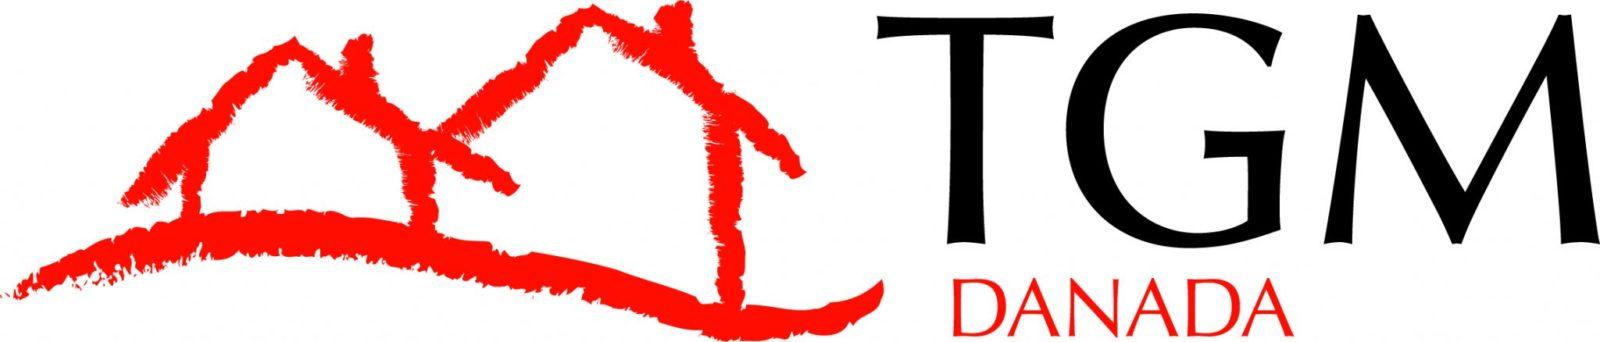 TGM Danada - TGM Communities